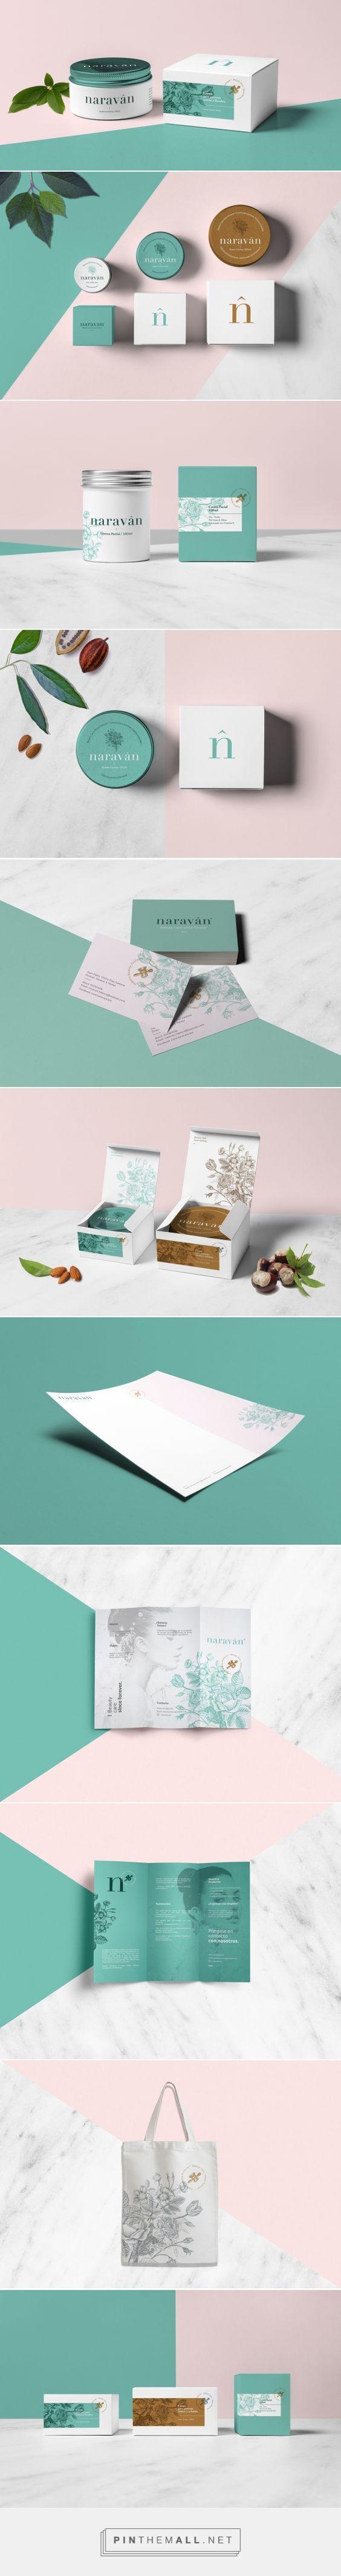 Naravân Branding | Fivestar Branding – Design and Branding Agency & Inspiration Gallery